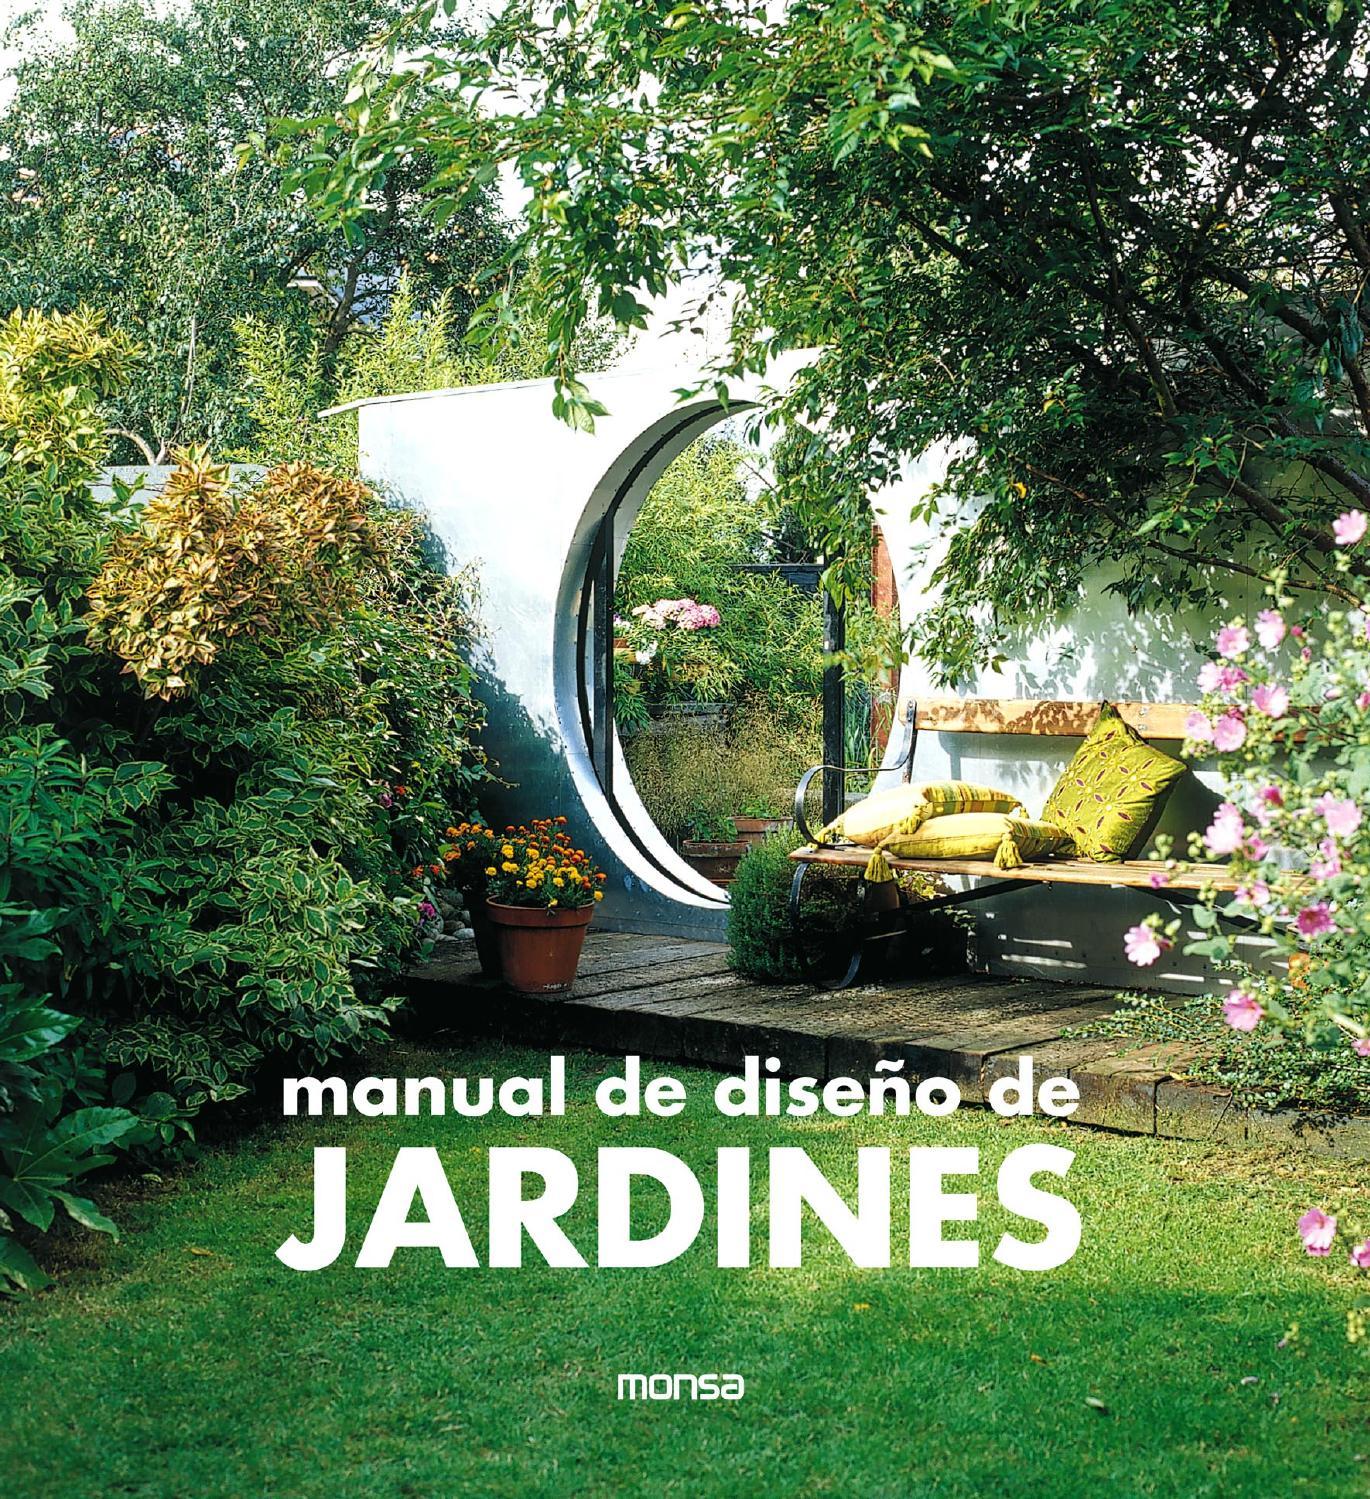 MANUAL DE DISEO DE JARDINES by Monsa Publications  Issuu